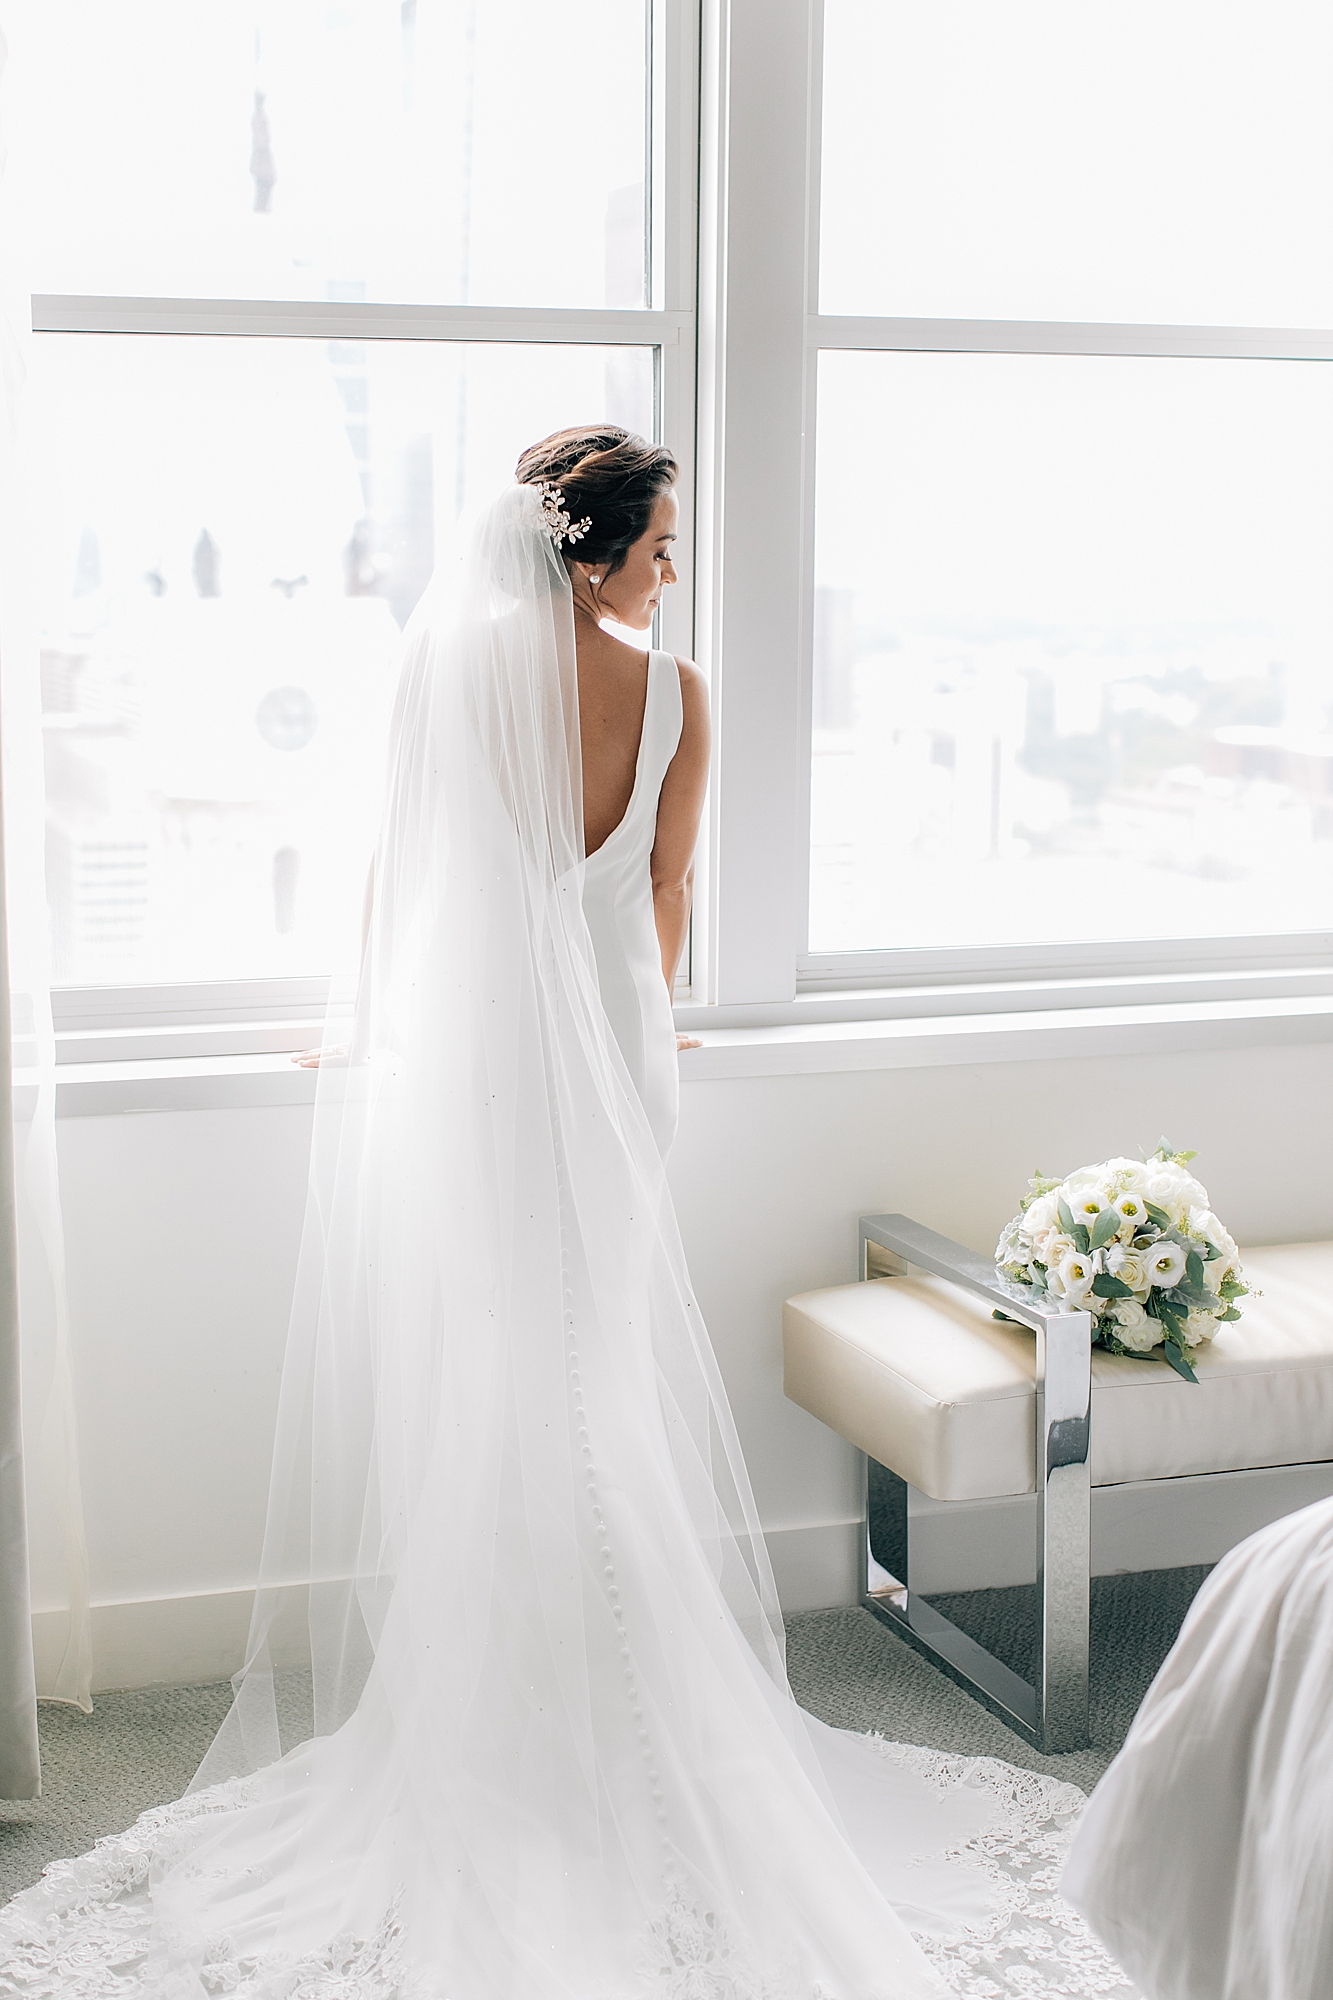 Cescaphe Philadelphia Film Wedding Photography by Magdalena Studios 9